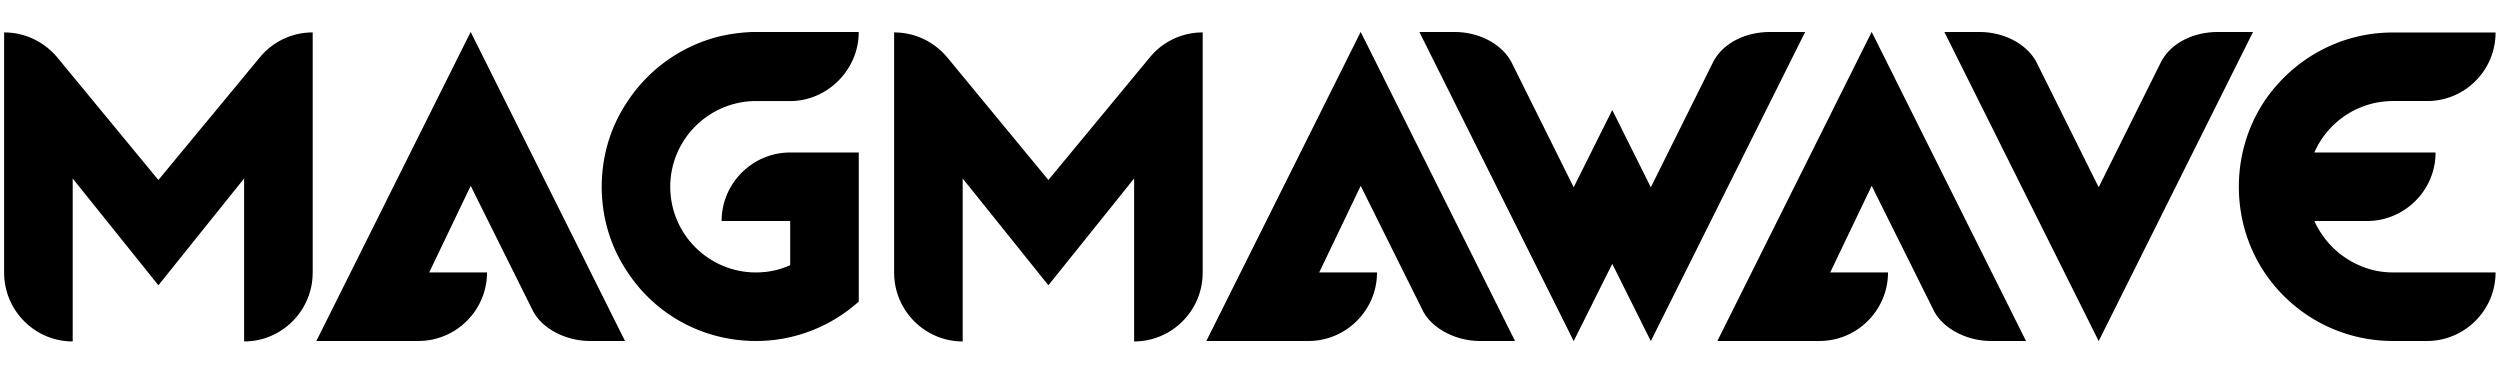 Font-MagmaWave-Caps-02.png